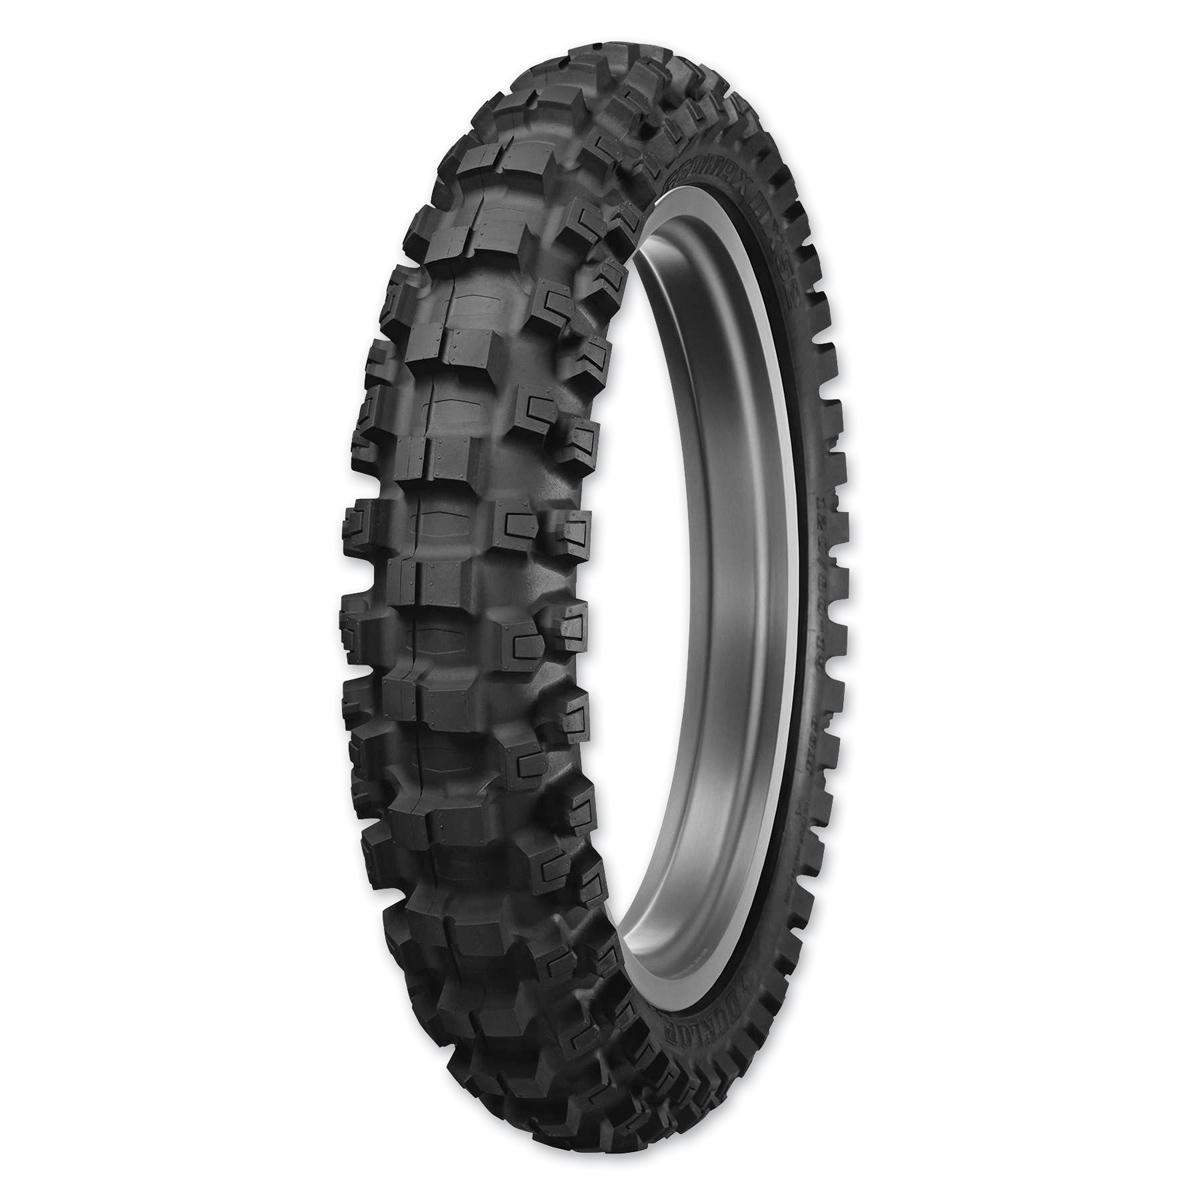 Dunlop MX52 80/100-12 I/T-H/T Rear Tire